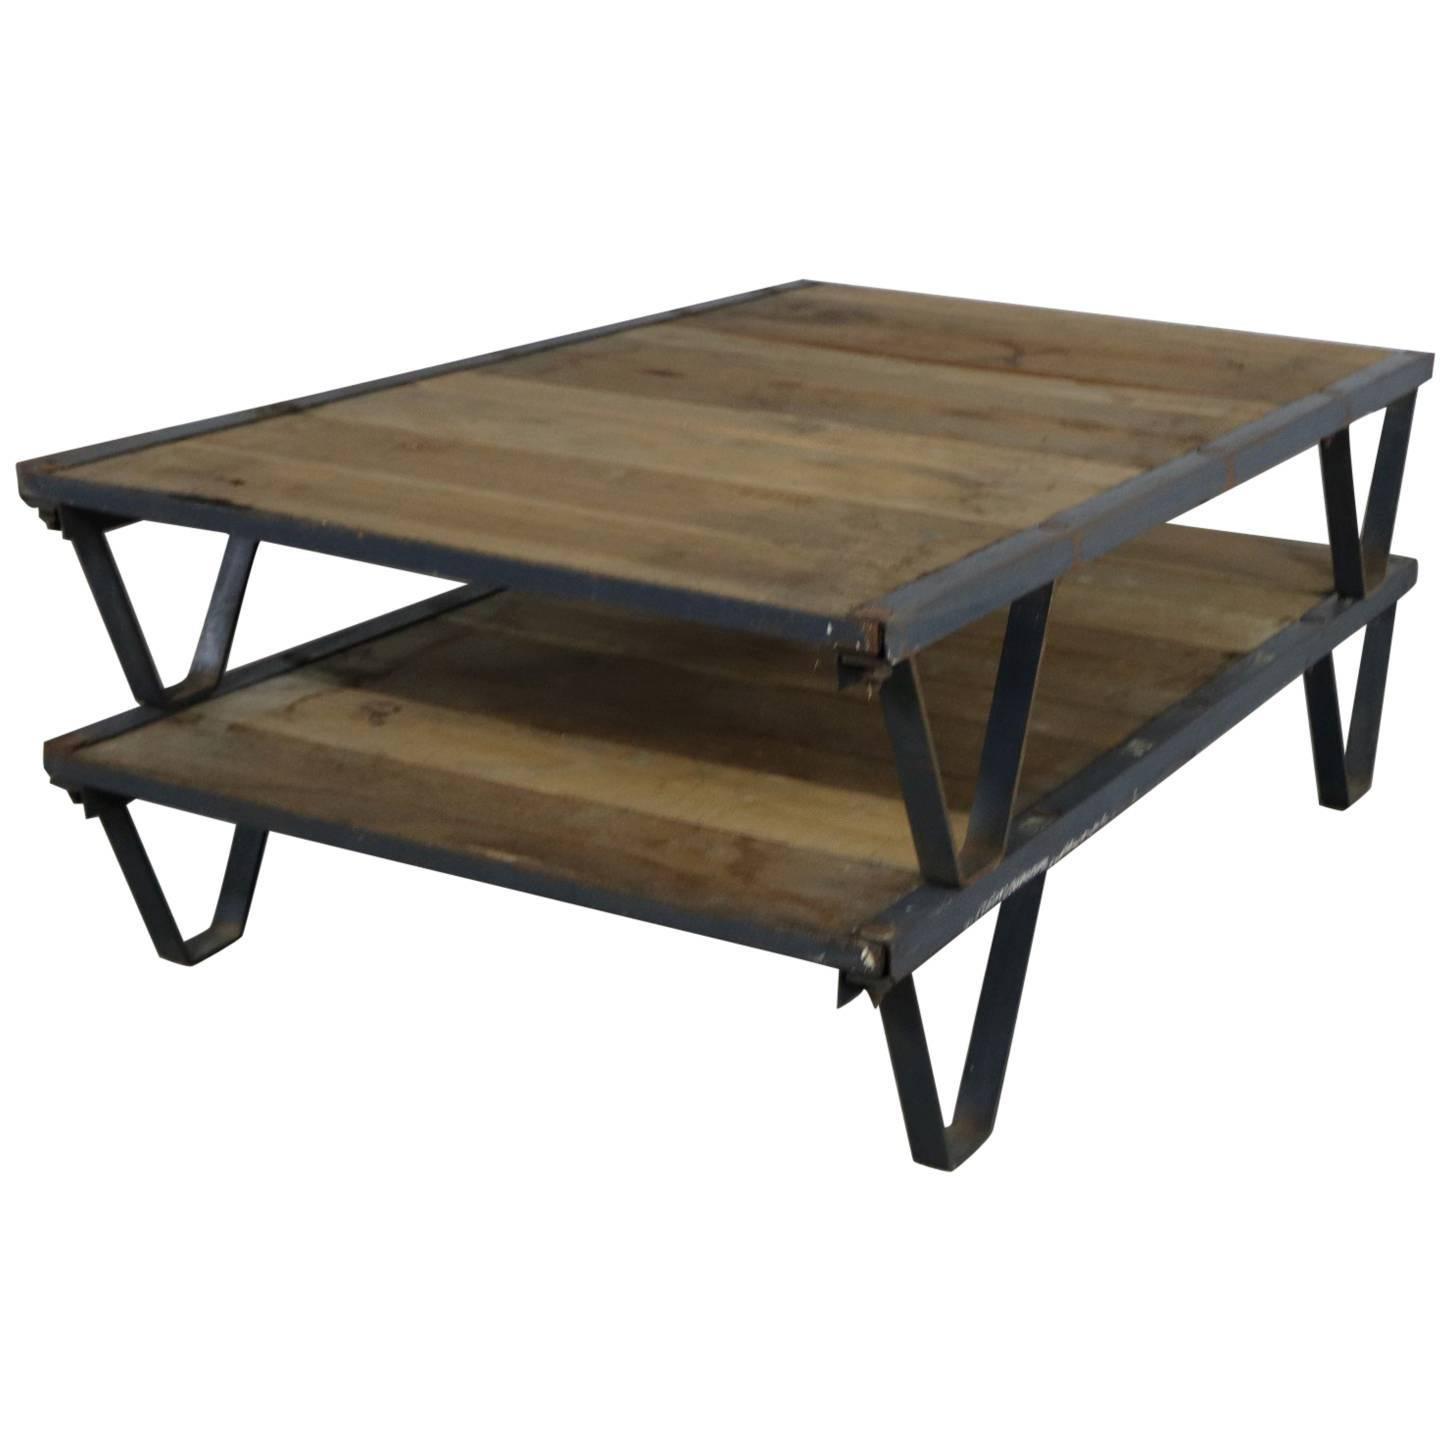 American Industrial Oak and Steel Pallet Coffee Table